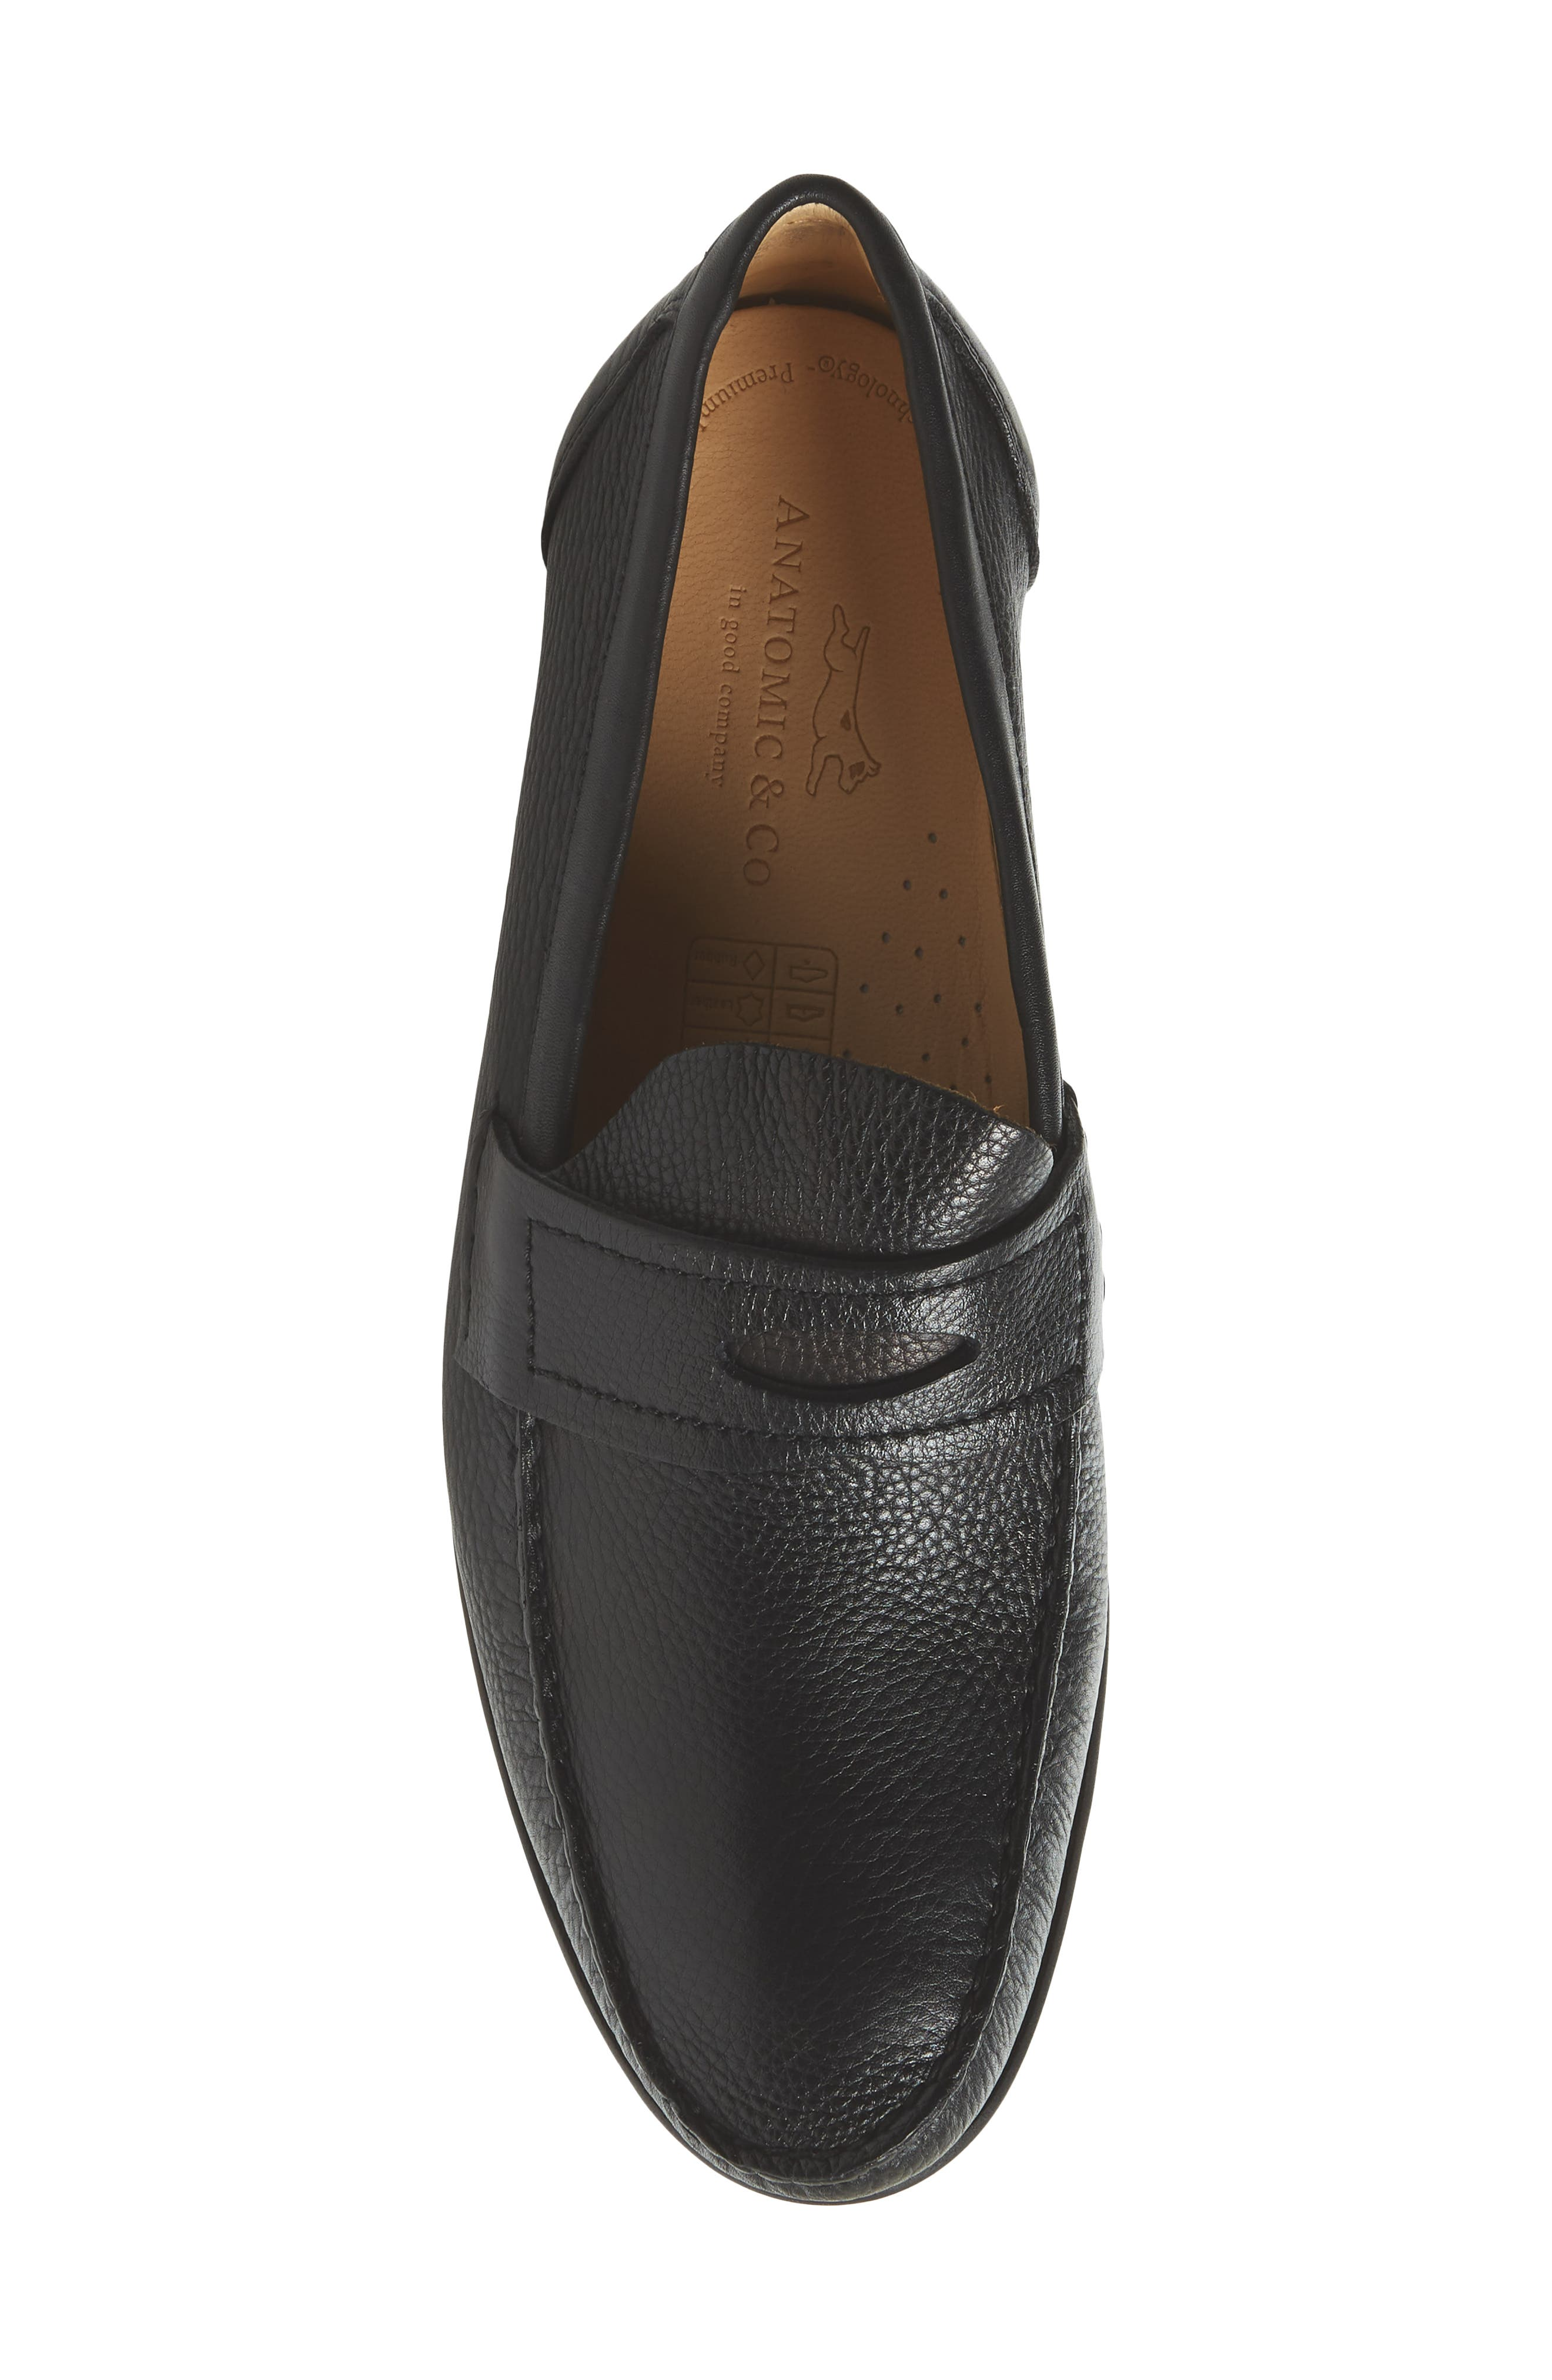 Eric Moc Toe Slip-On Loafer,                             Alternate thumbnail 5, color,                             Floater Black Leather